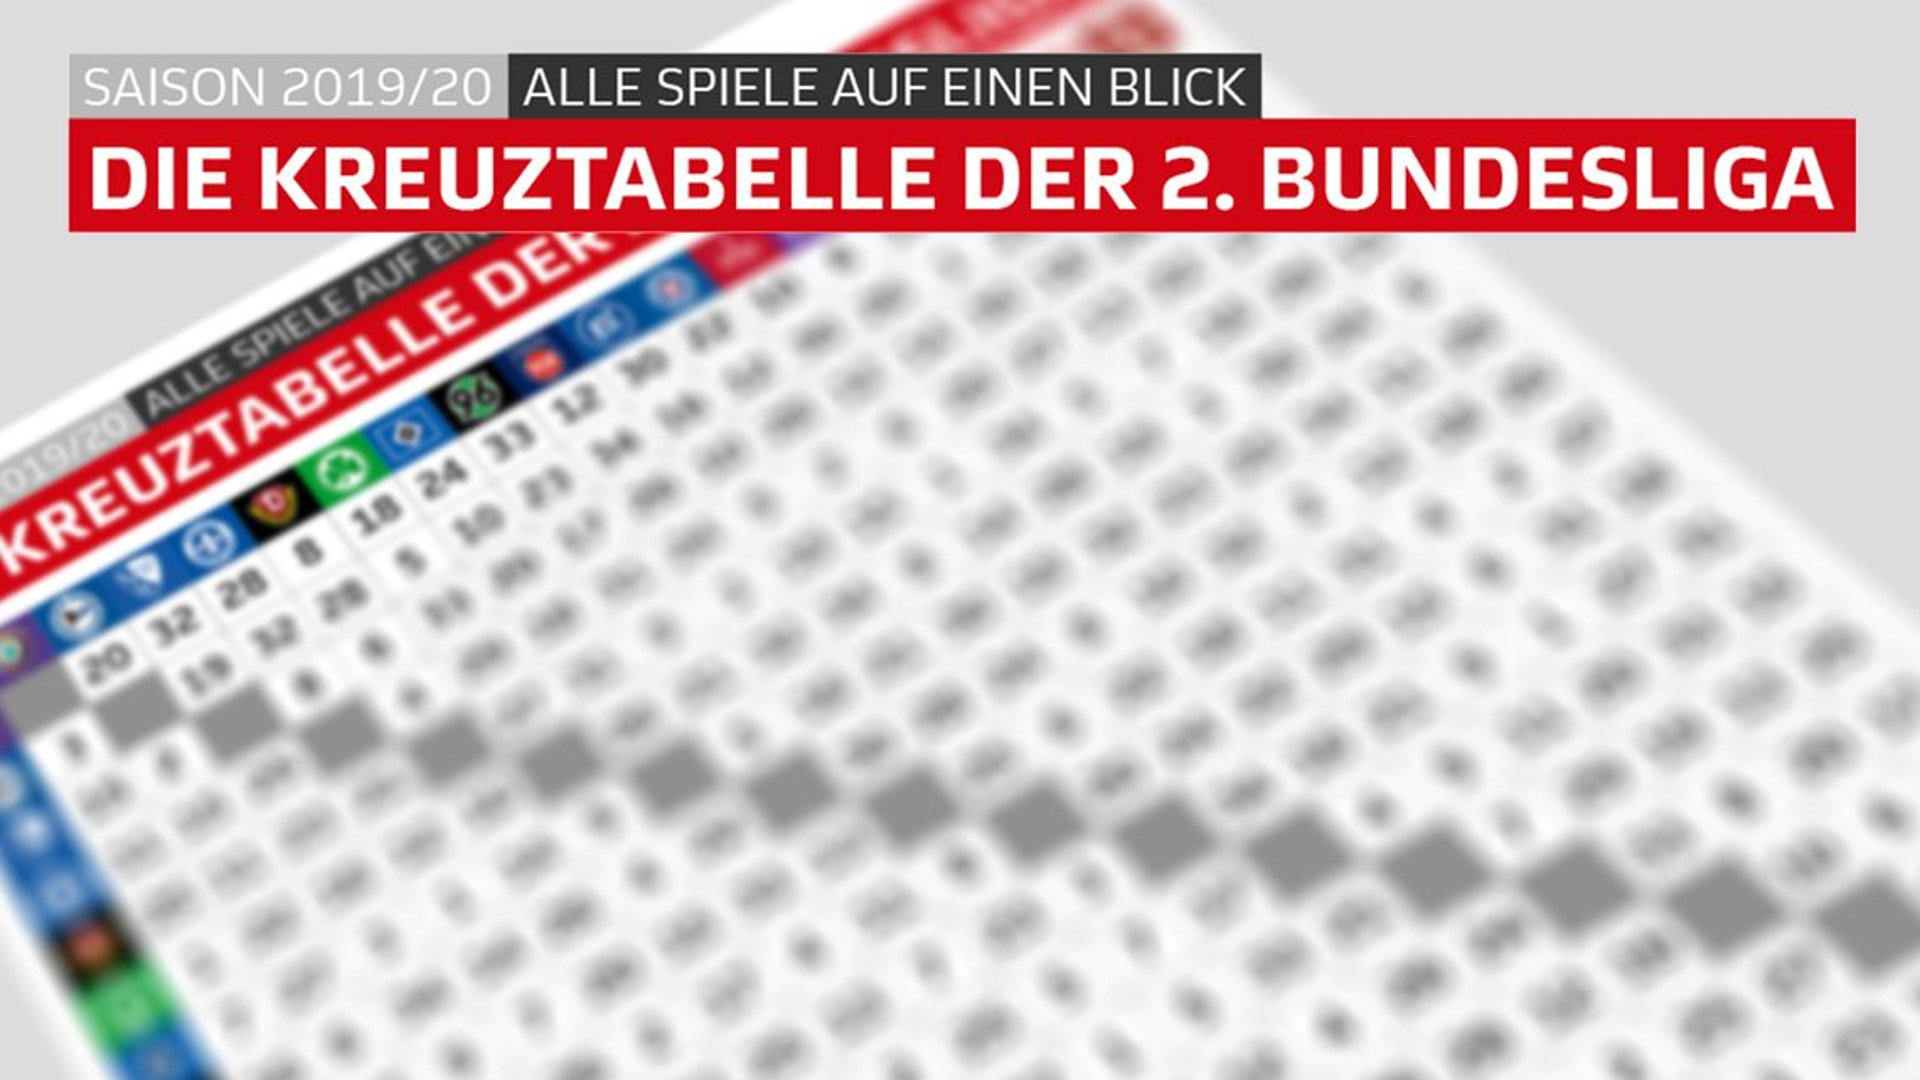 2 Bundesliga Kreuztabelle Alle Spiele Der Saison 2019 20